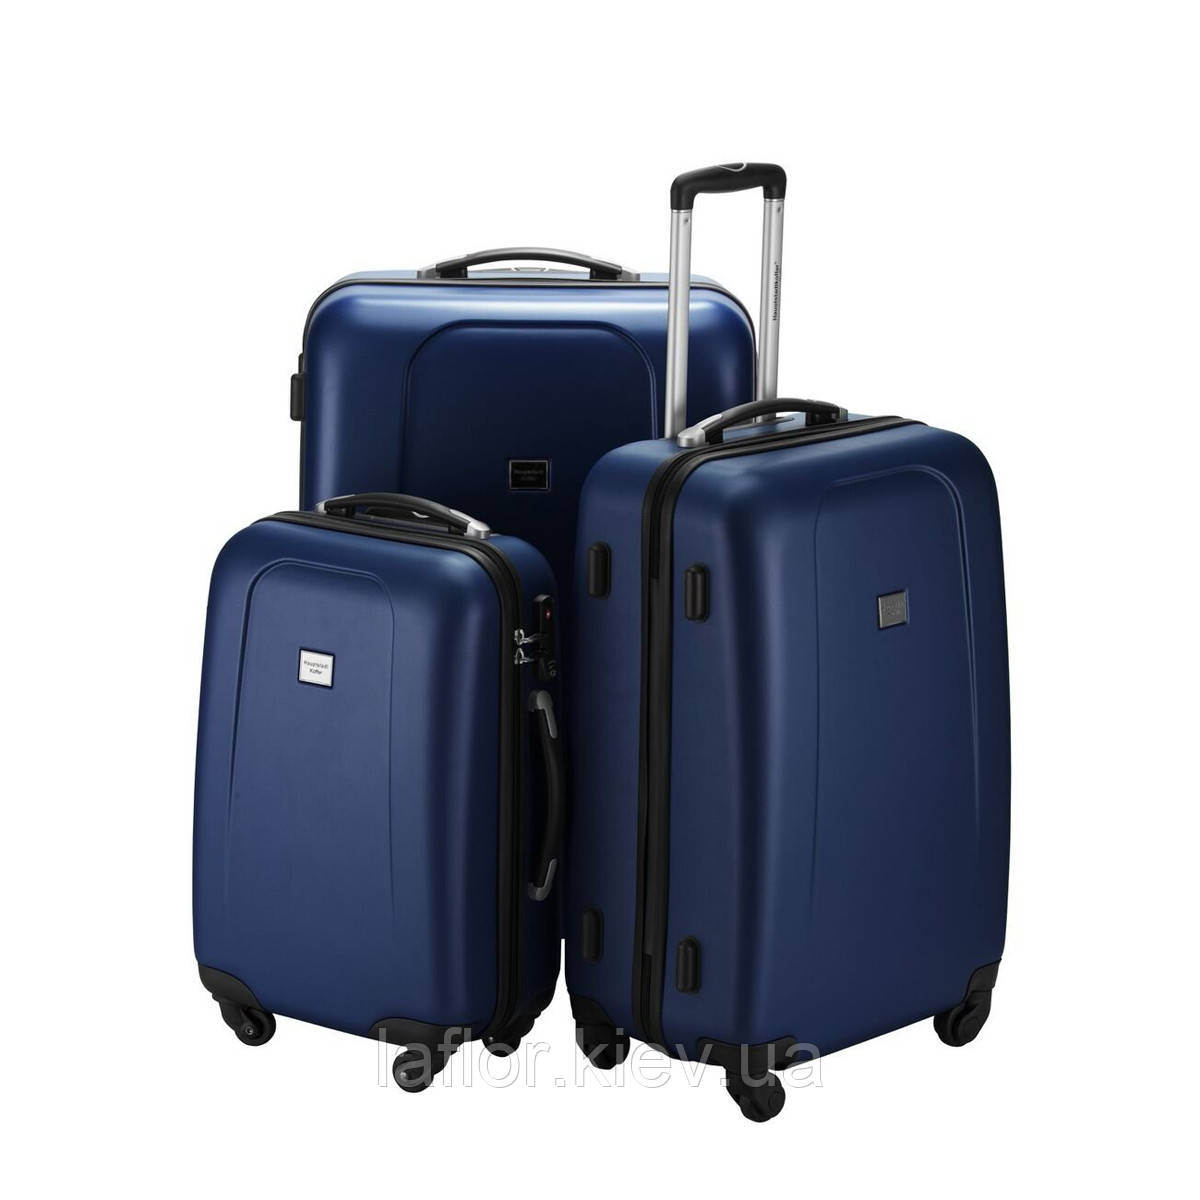 Набор чемоданов Hauptstadtkoffer Wedding темно-синий